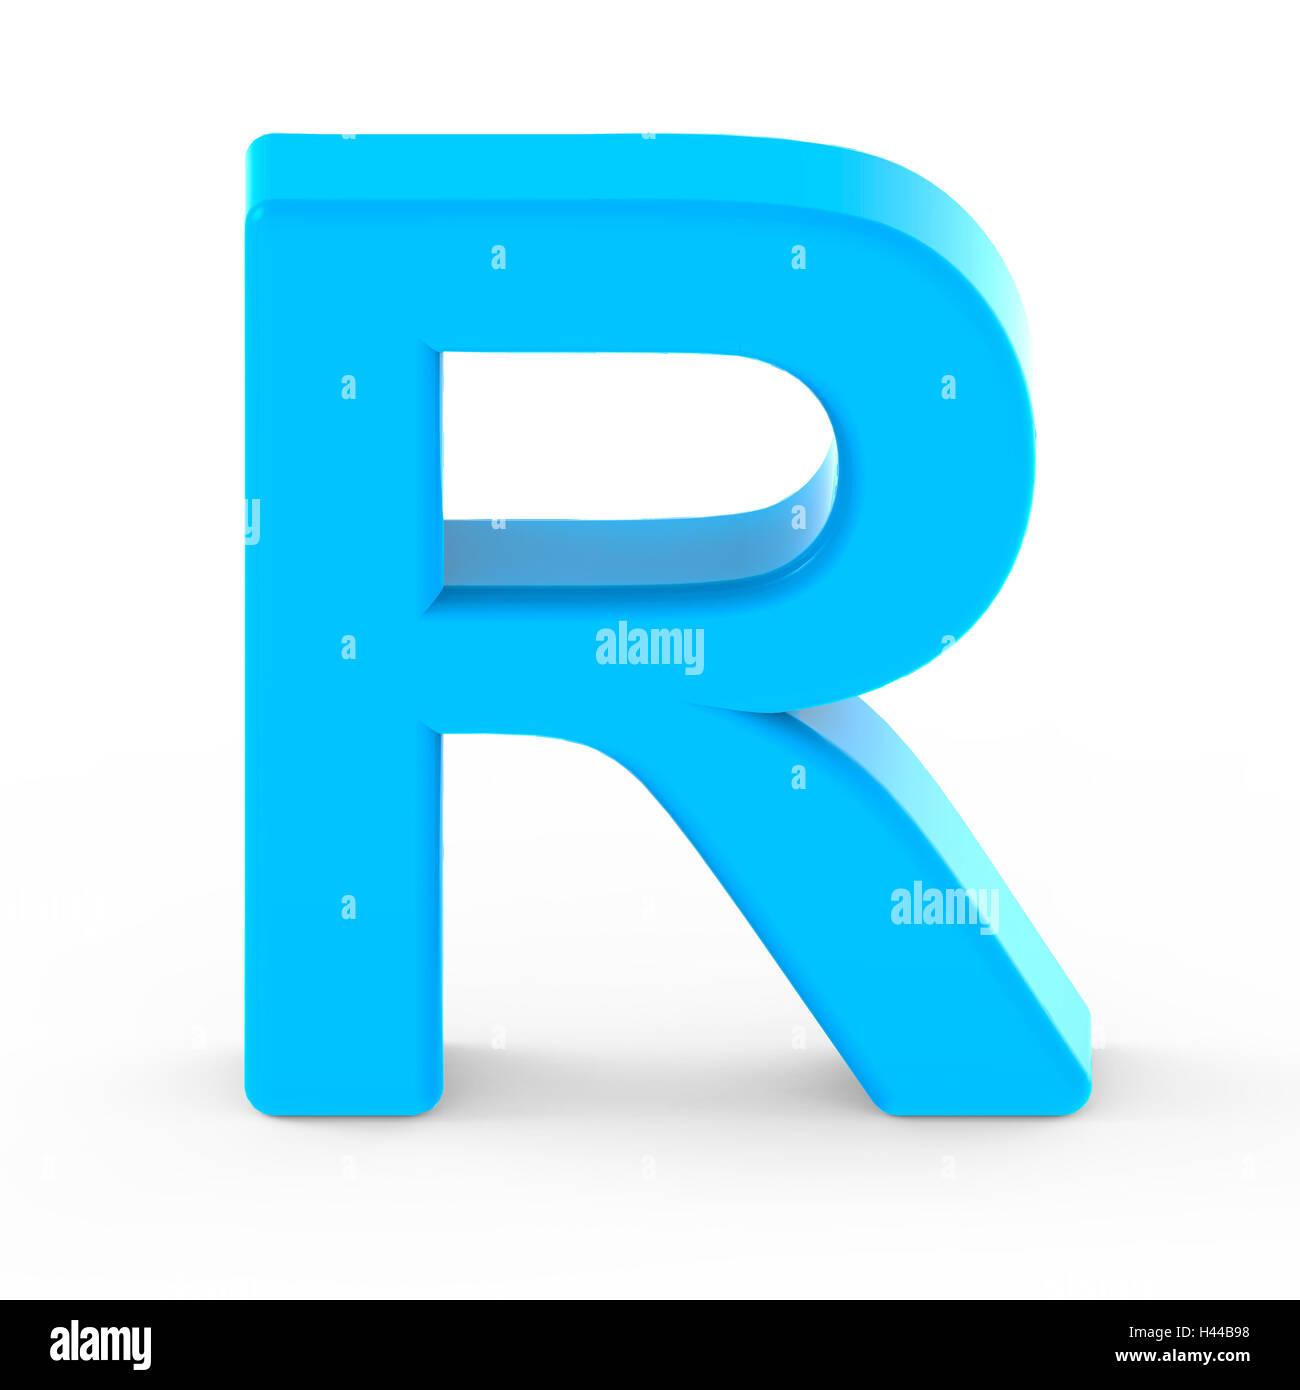 Light blue letter r 3d rendering graphic isolated white background light blue letter r 3d rendering graphic isolated white background thecheapjerseys Images